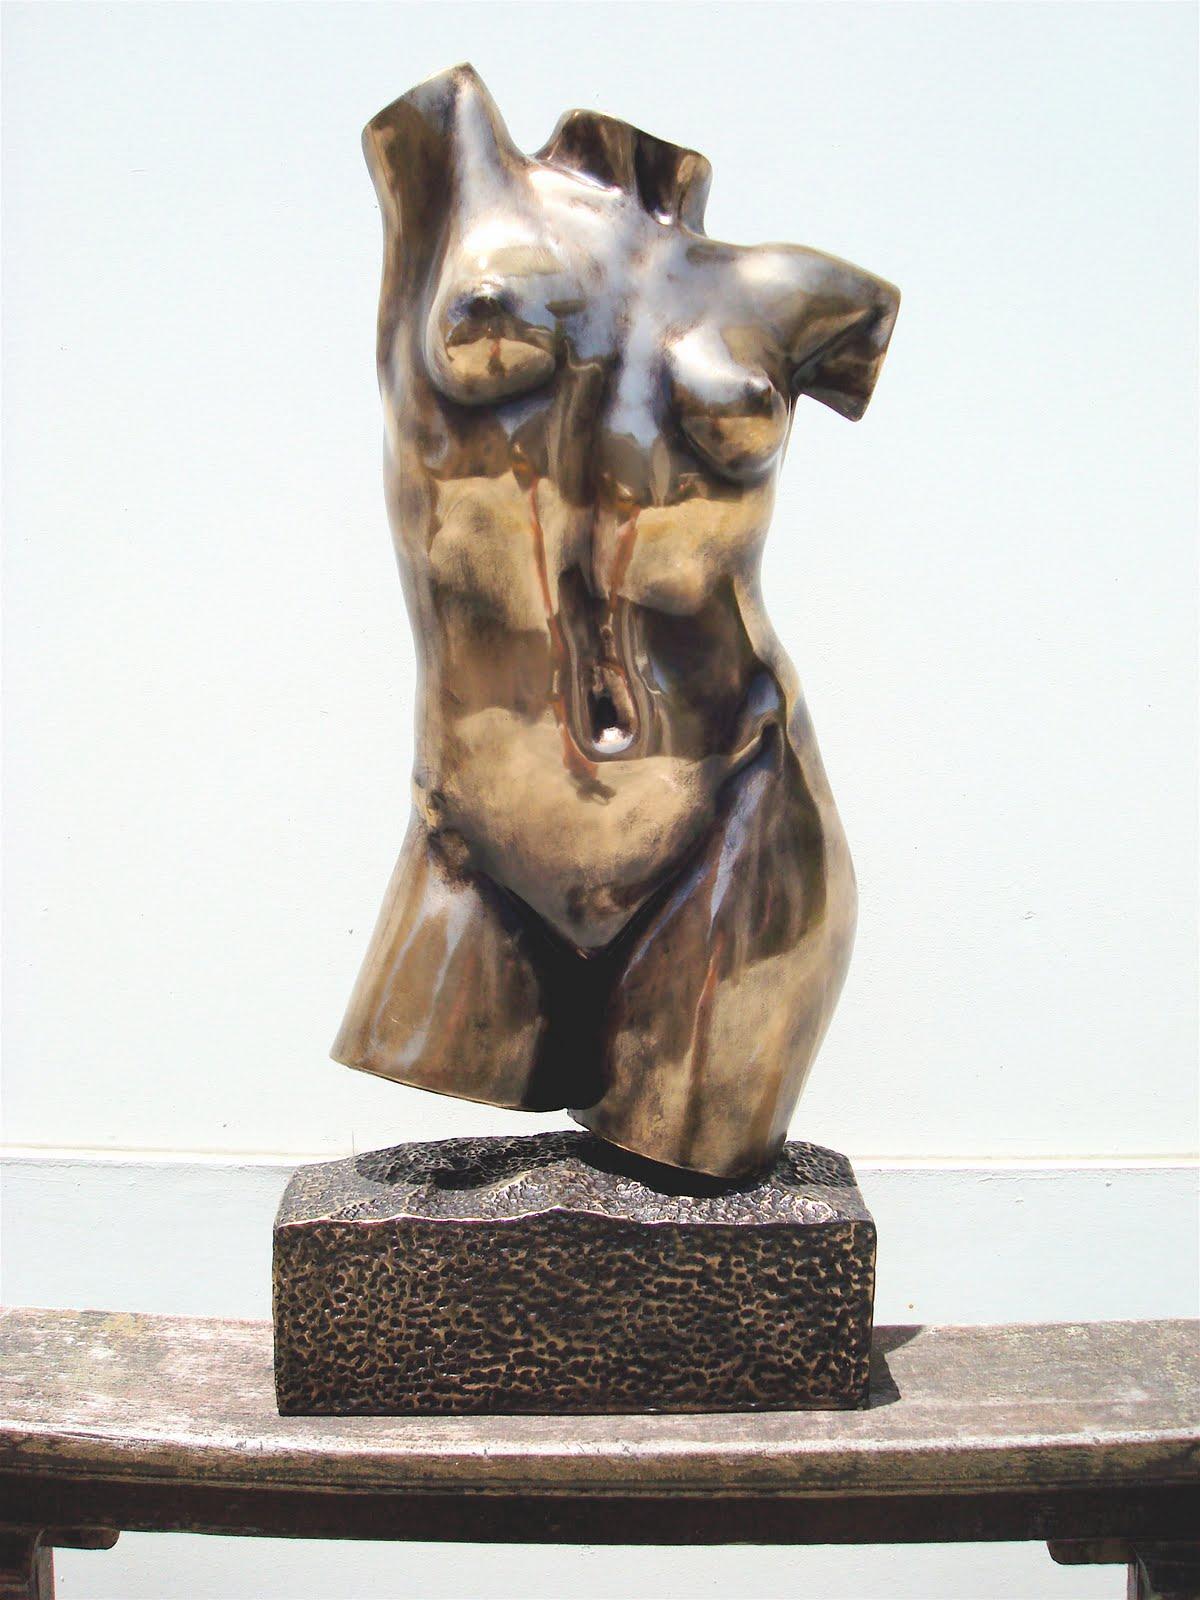 http://2.bp.blogspot.com/-x_iZ1-MJDno/Tff5bXzFWDI/AAAAAAAAAkk/iDnbP7mAJQE/s1600/Bronze%2BFemale%2BTorso%2BSculpture%2Bby%2BNick%2BPetronzio.JPG